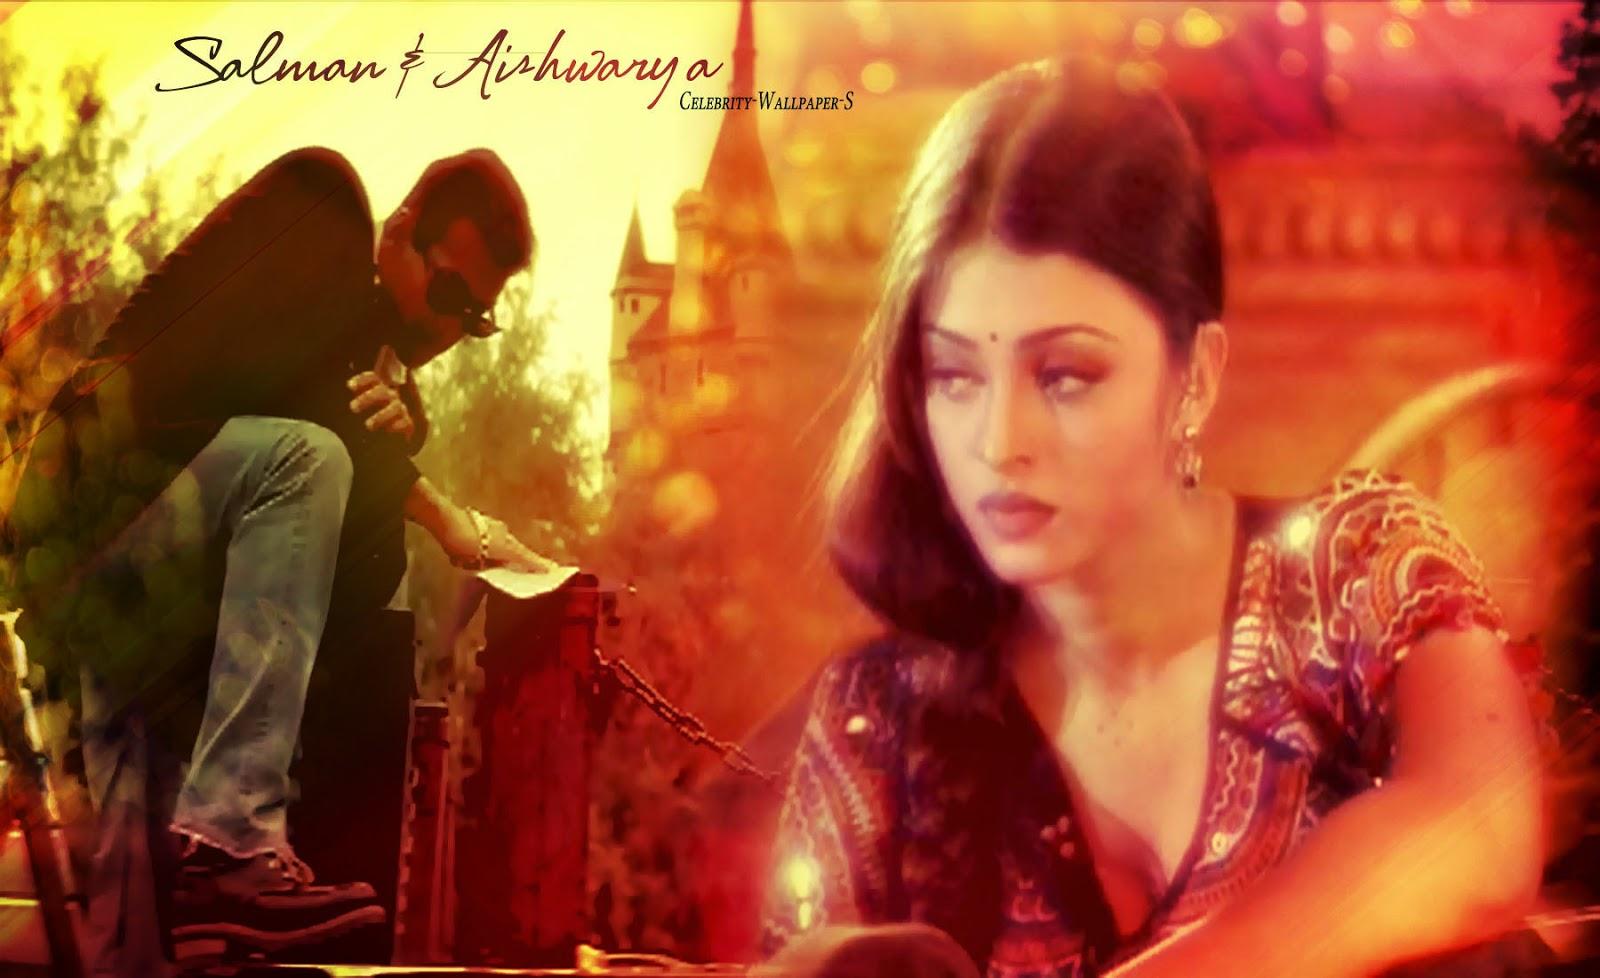 Aishwarya Rai Salman Khan Wallpaper HD Hum Dil De Chuke